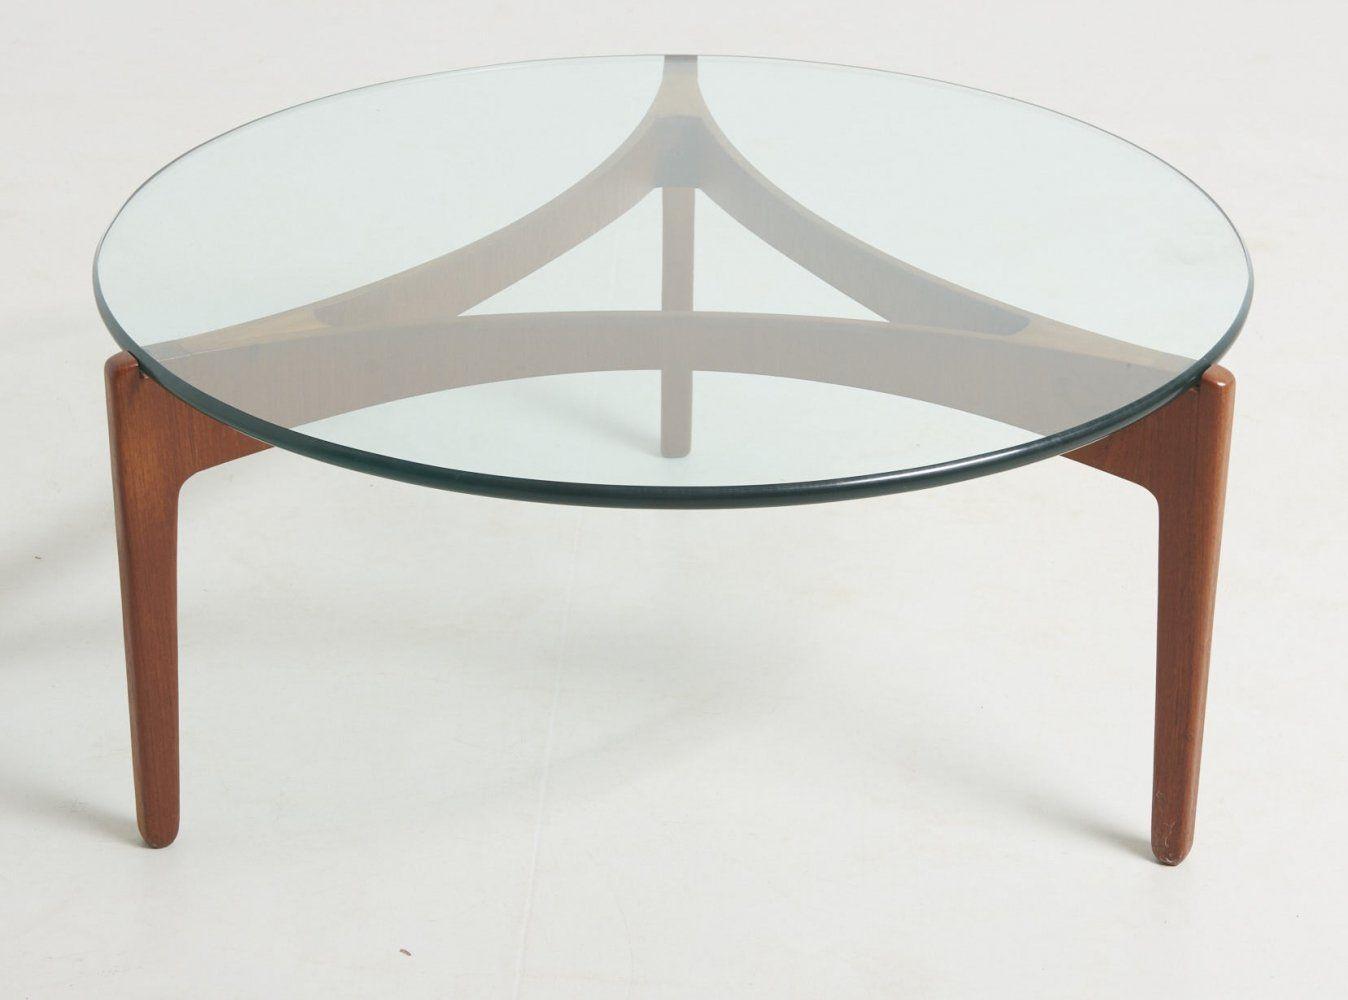 For Sale Three Legged Coffee Table By Sven Ellekaer Denmark 1960 S [ 1000 x 1348 Pixel ]